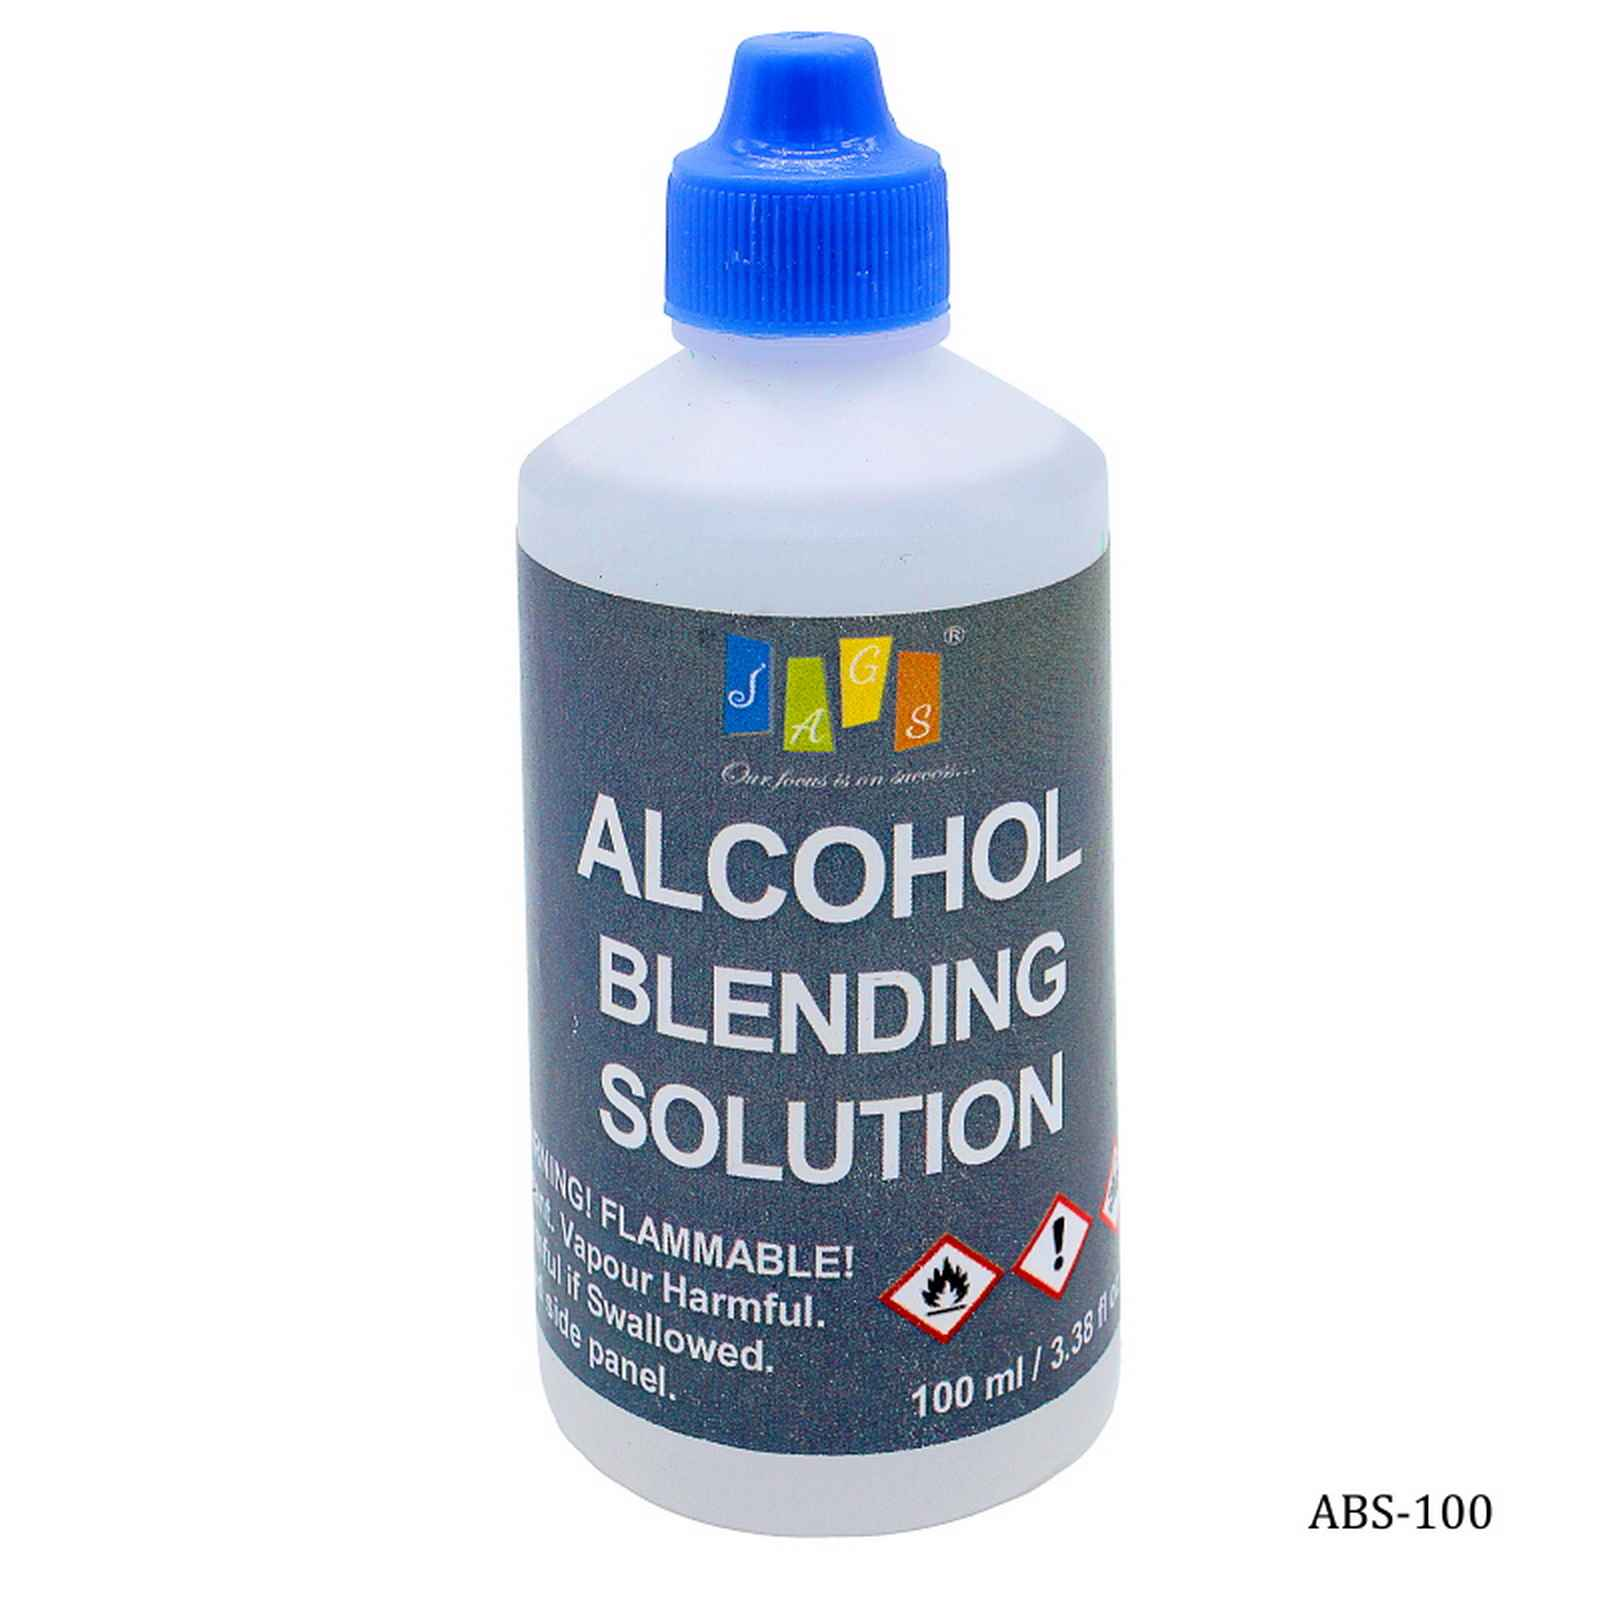 JAGS Alcohol Blending Solution (100 Ml)